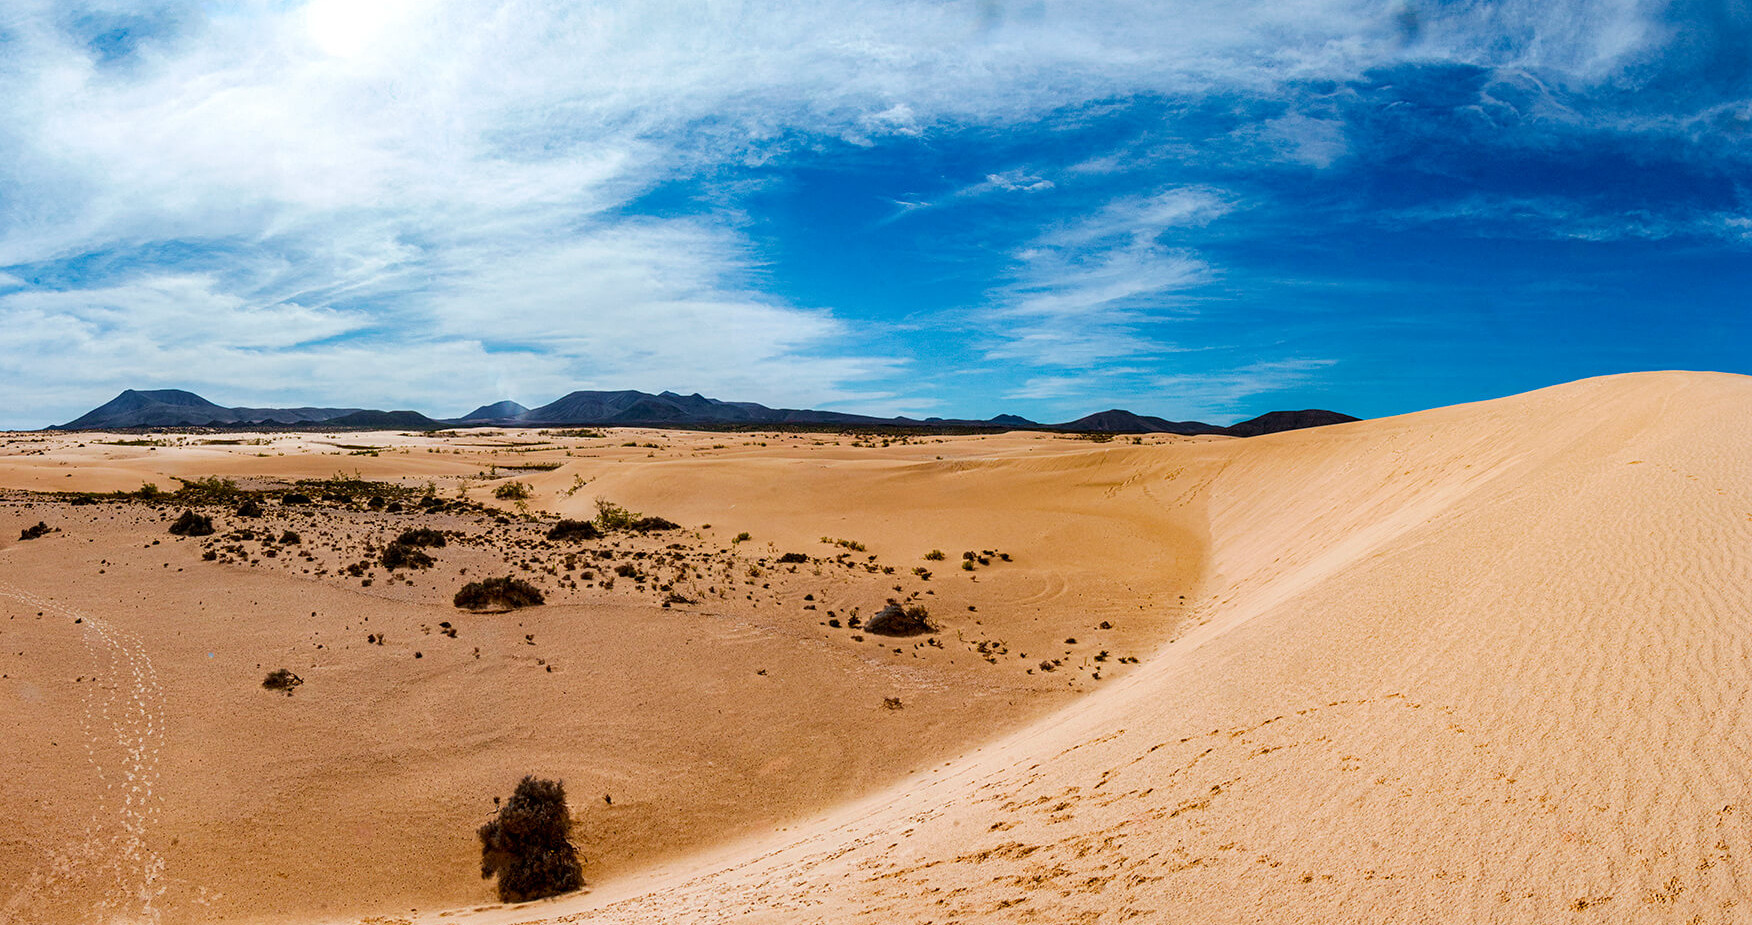 Spain - Fuerteventura Dunes